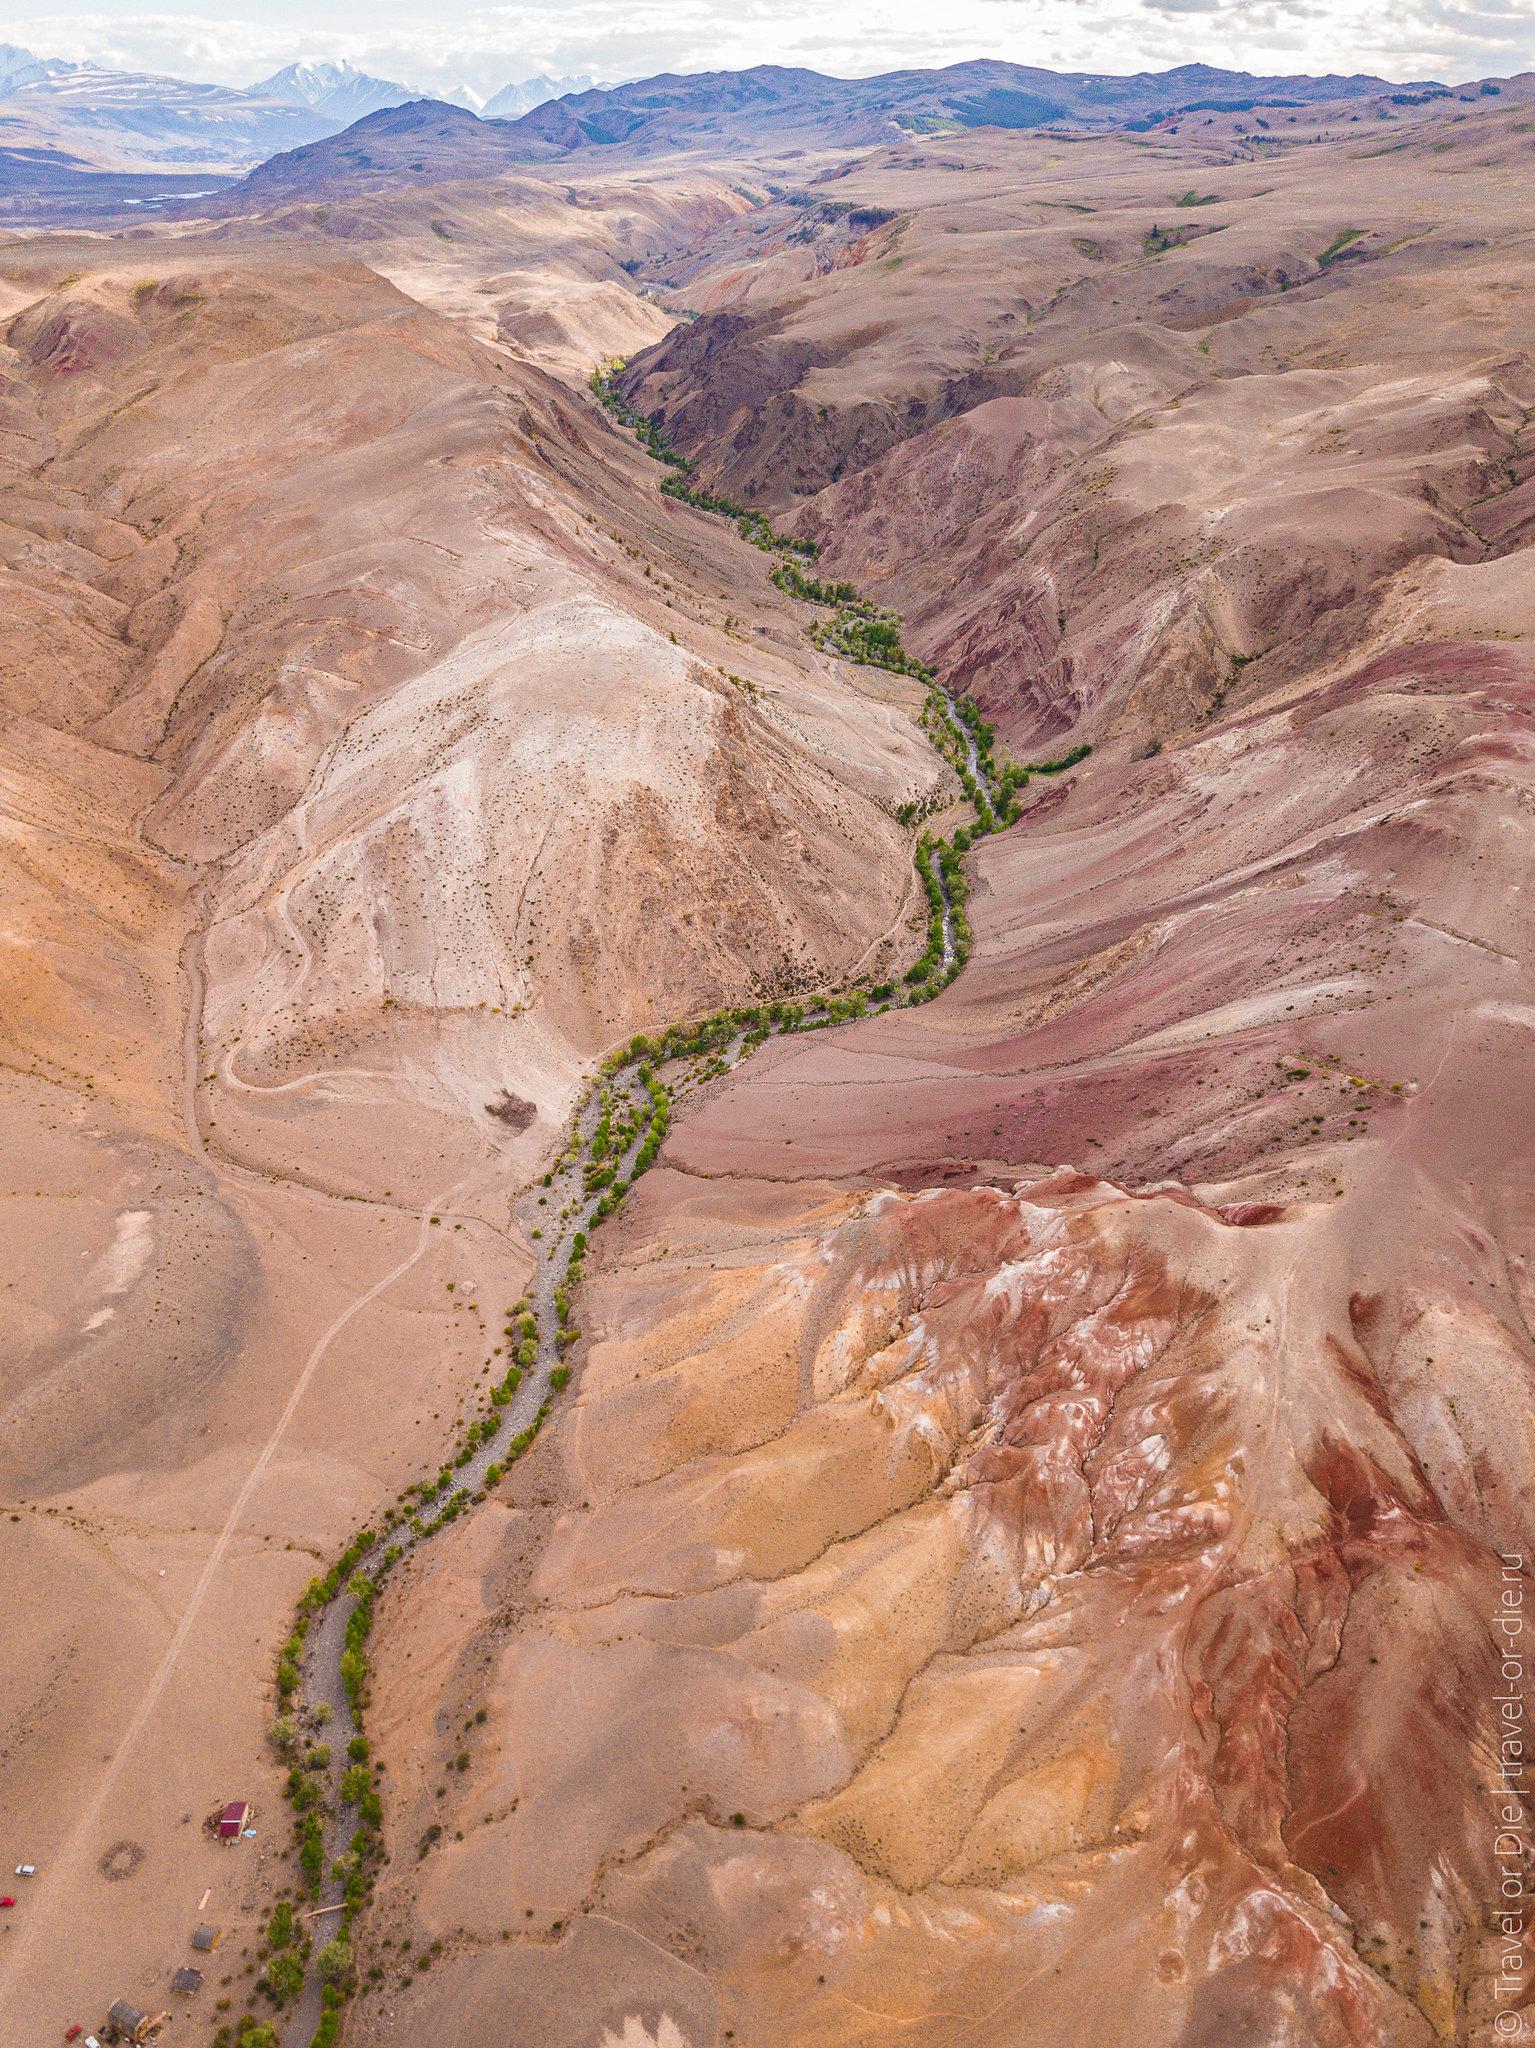 Mars-Kyzyl-Chin-Valley-Altay-dji-mavic-0428